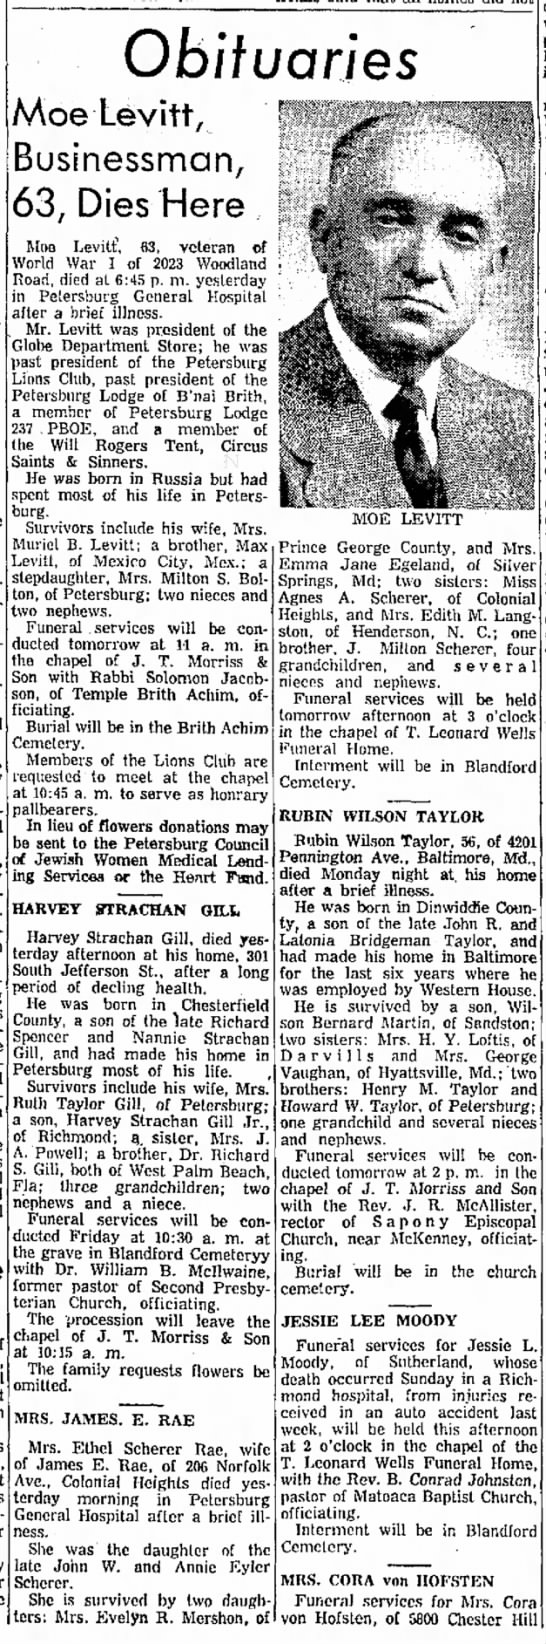 Ethel Scherer Rae obituary - 30 Sep 1959 - Progess-Index, Petersburg VA - to a member' an sworn Arlie s , Sid Levy,...